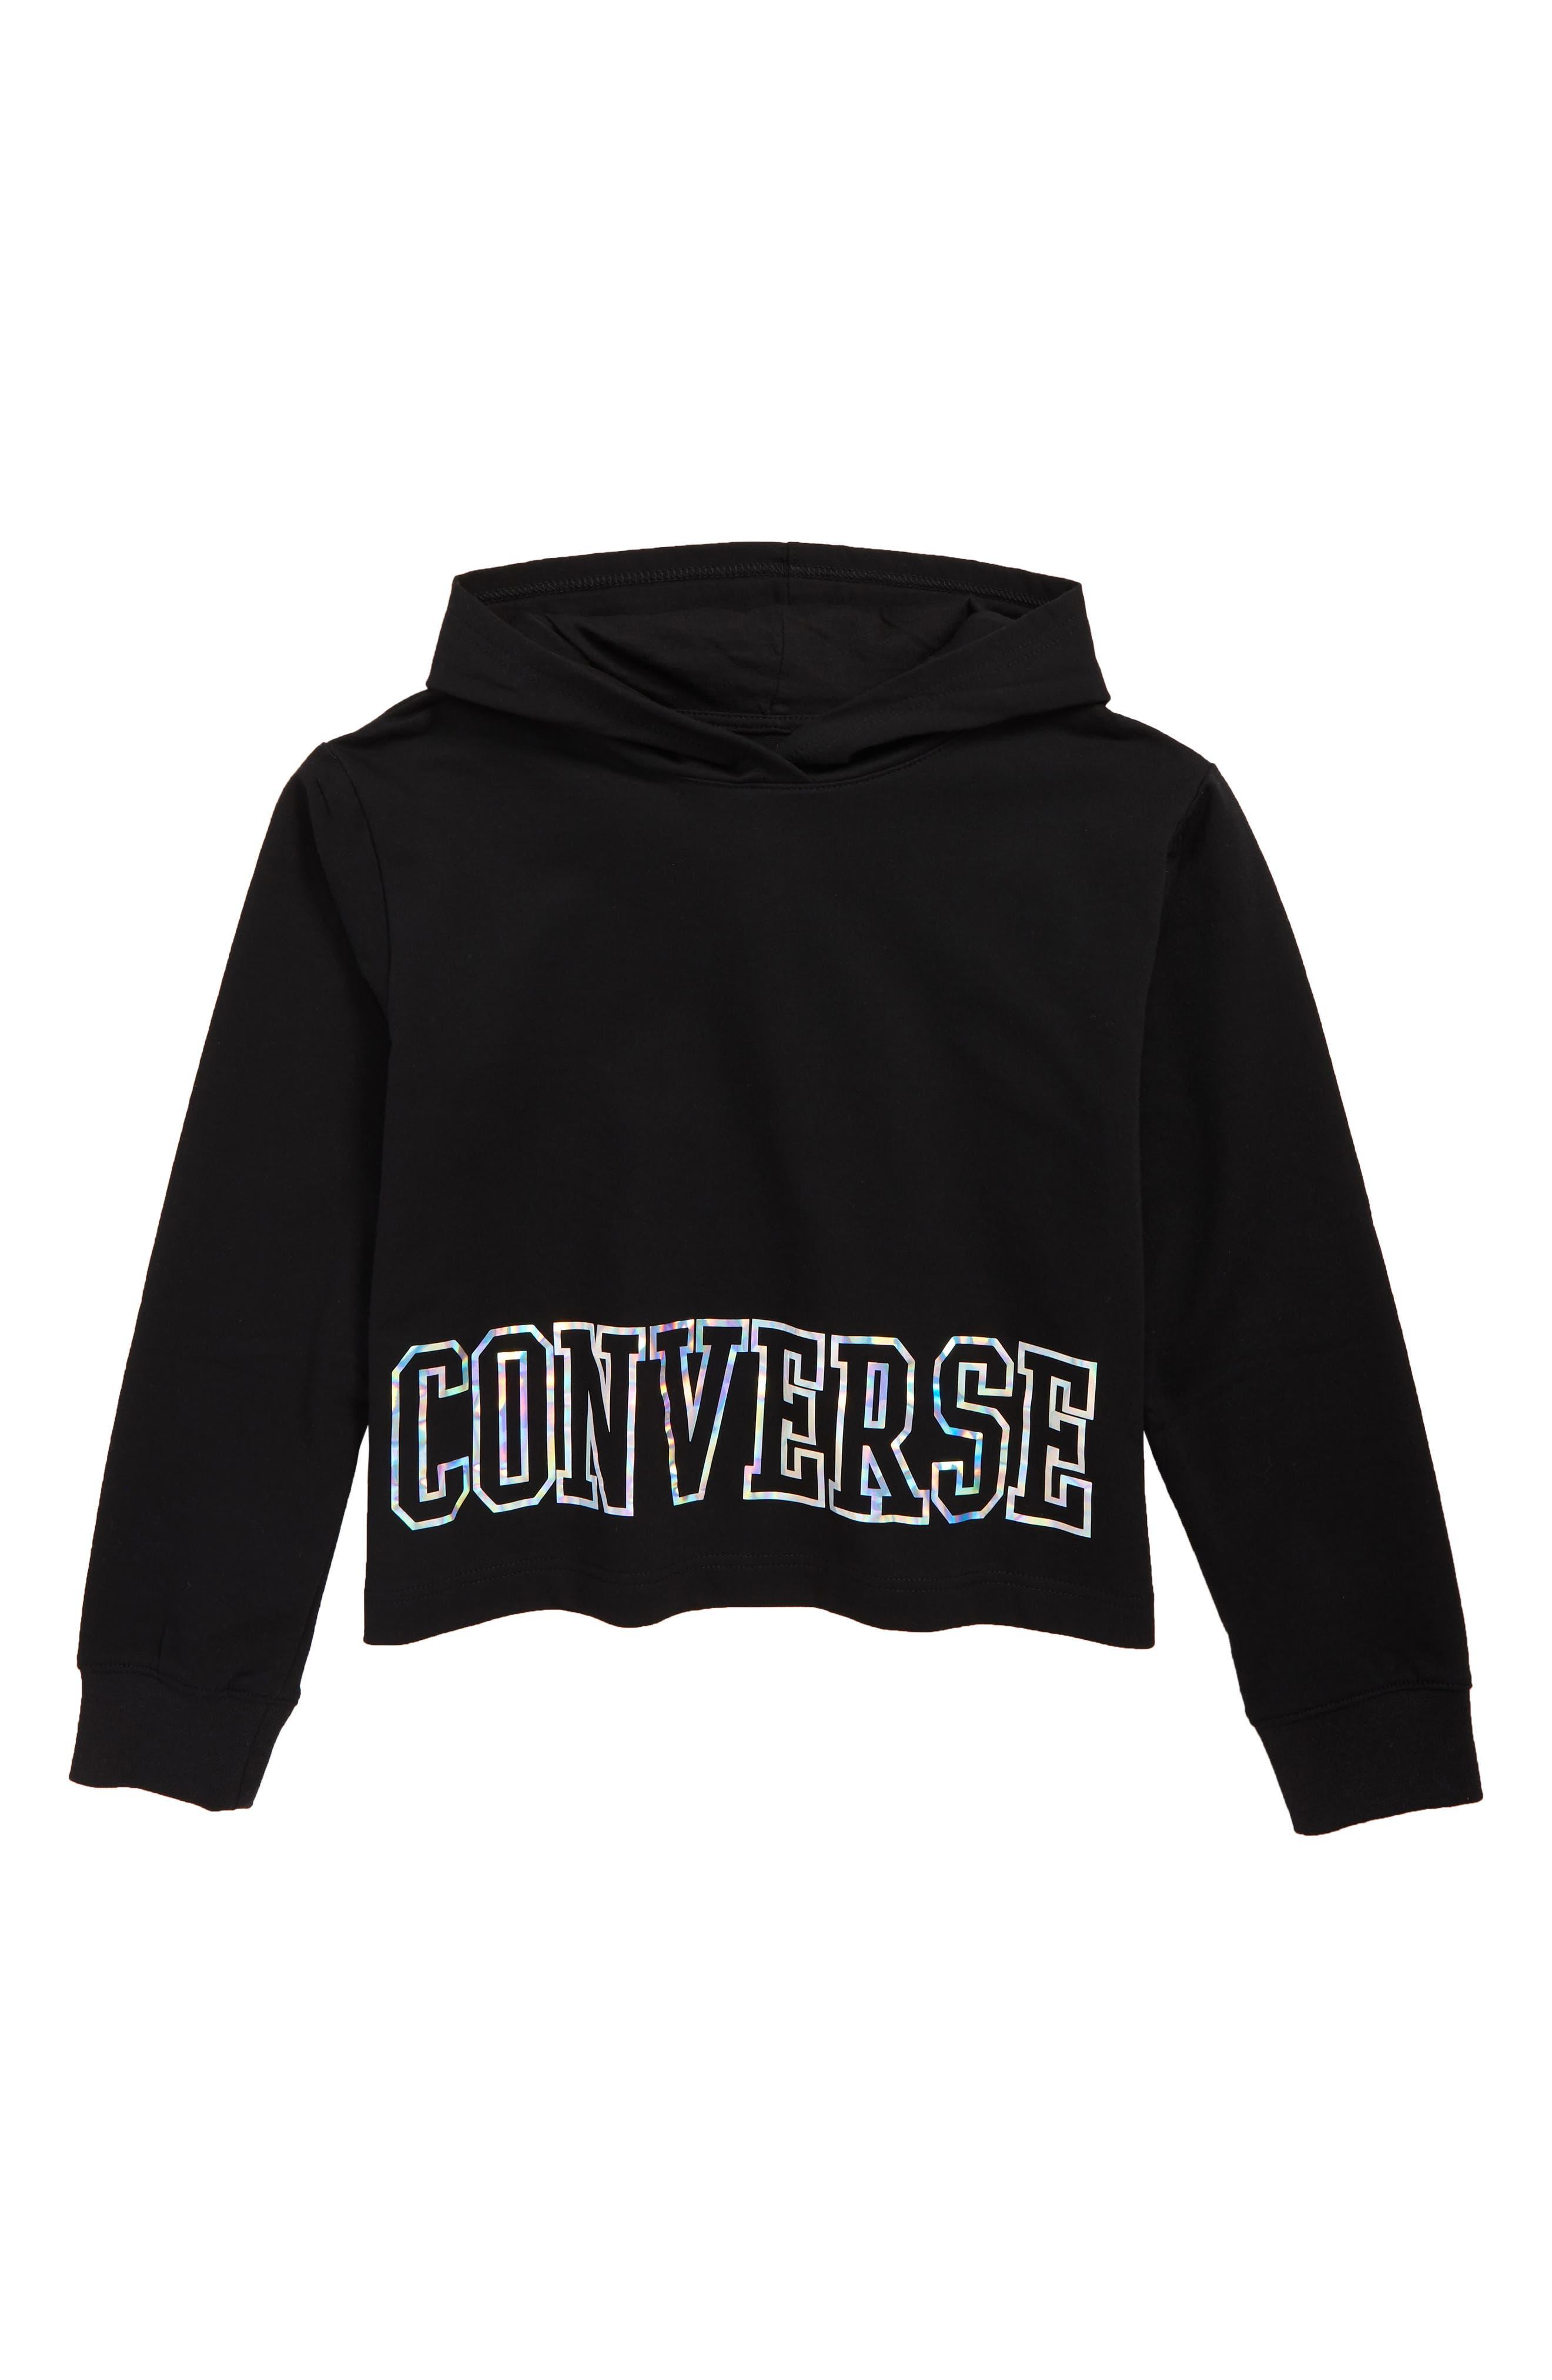 CONVERSE, Iridescent Logo Hoodie, Main thumbnail 1, color, BLACK